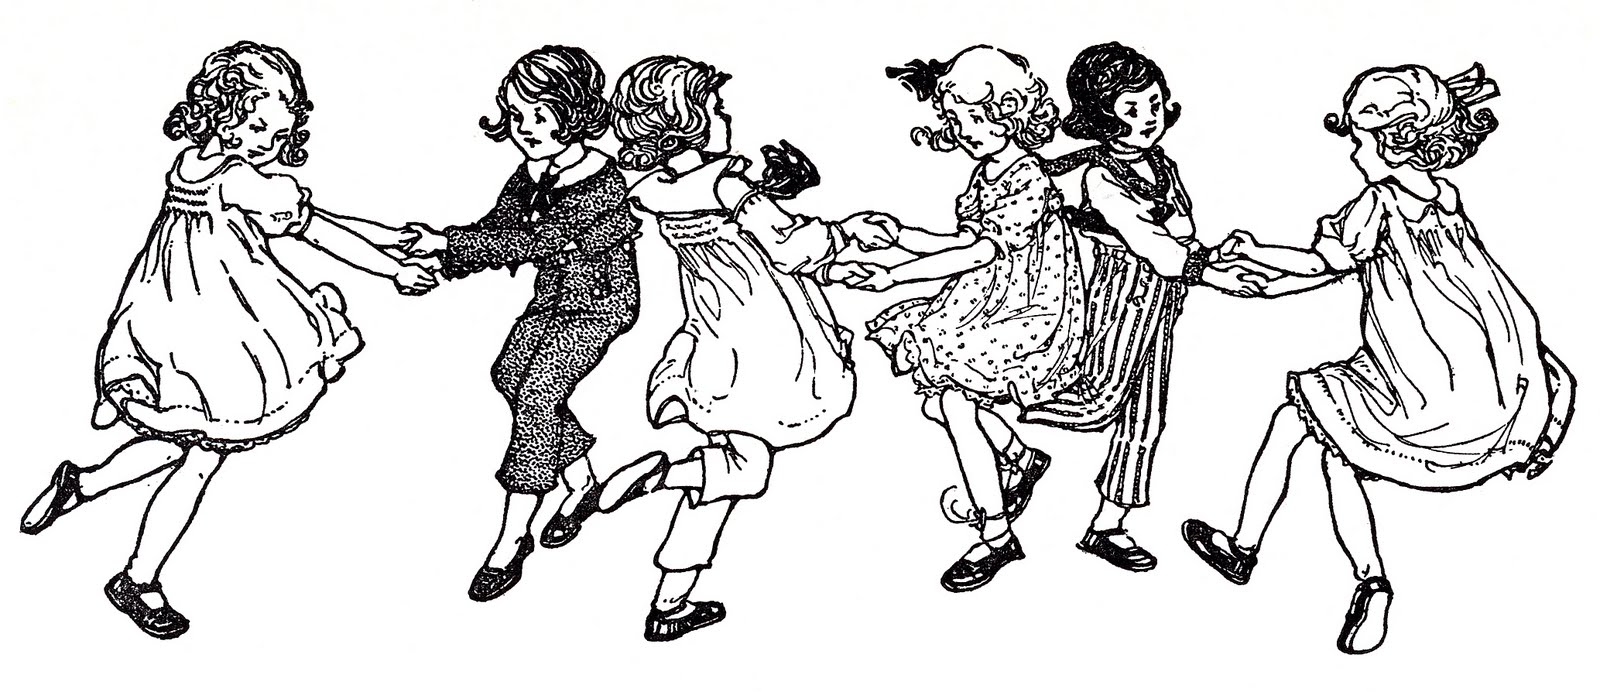 Image children swedish song. Dancing clipart vintage